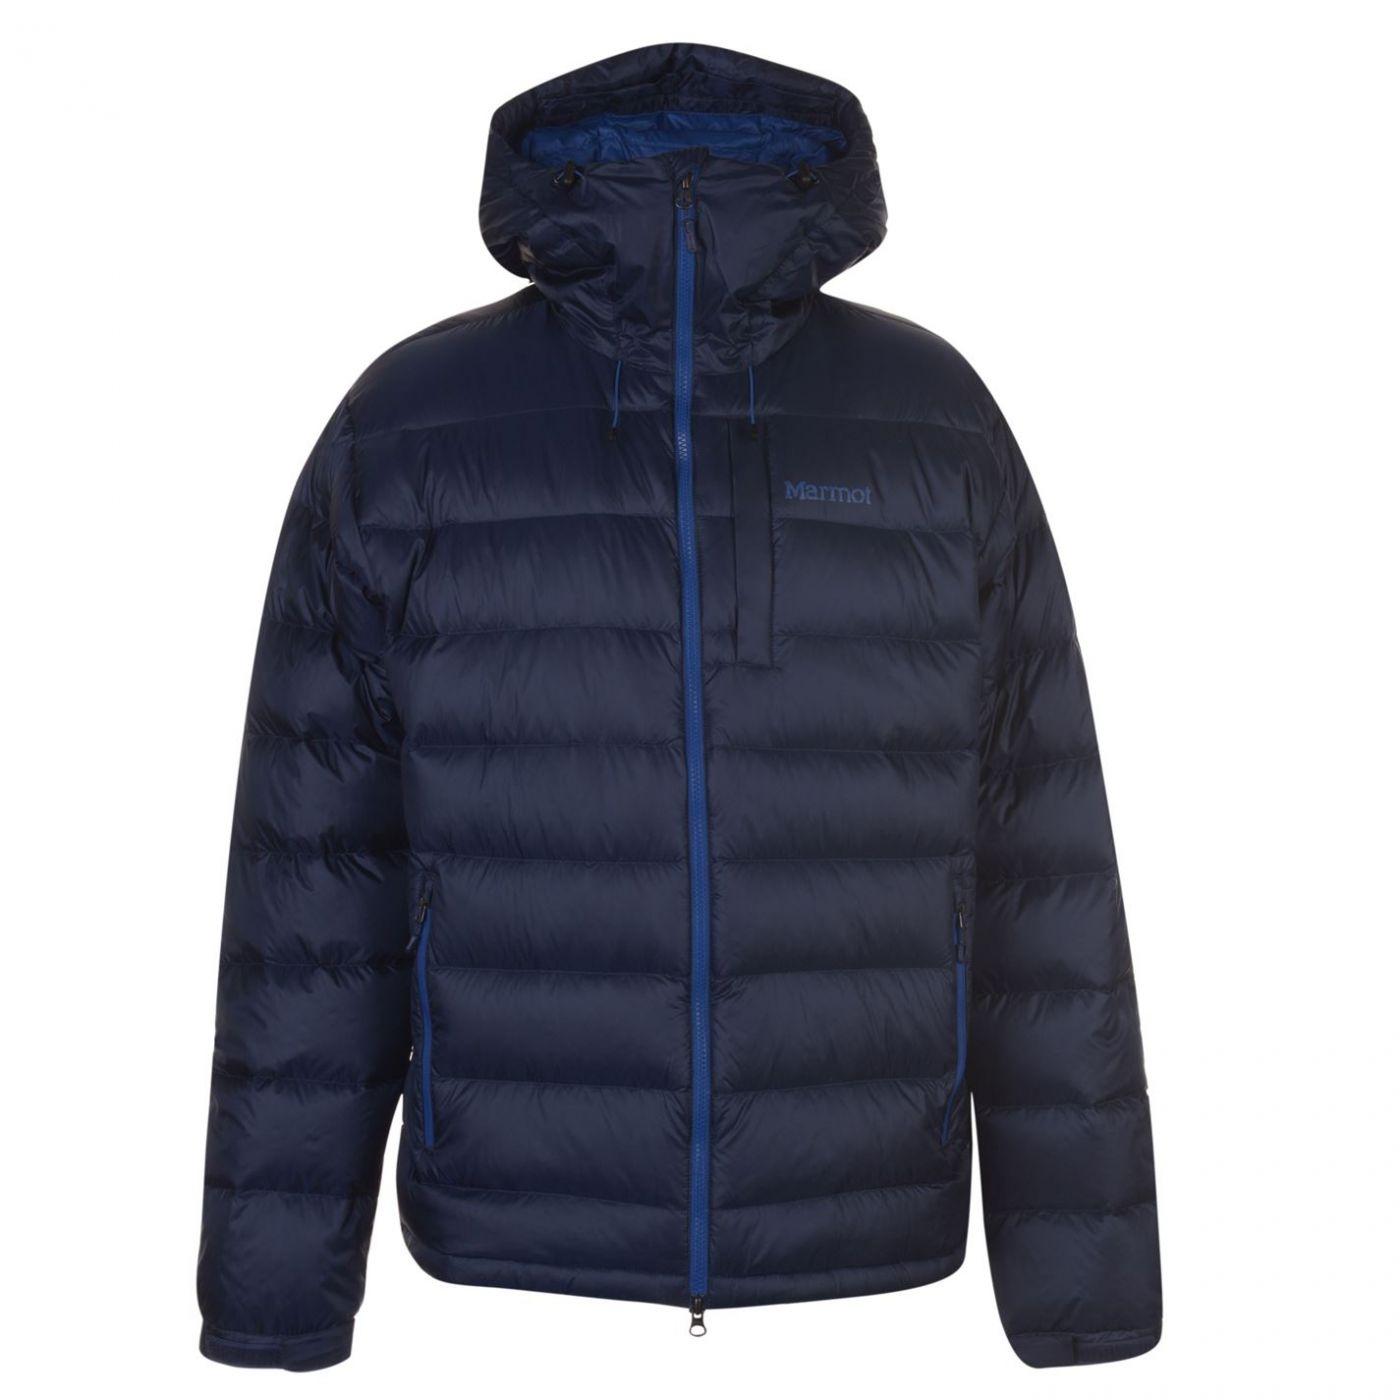 Marmot Dablam Puffer Jacket Mens